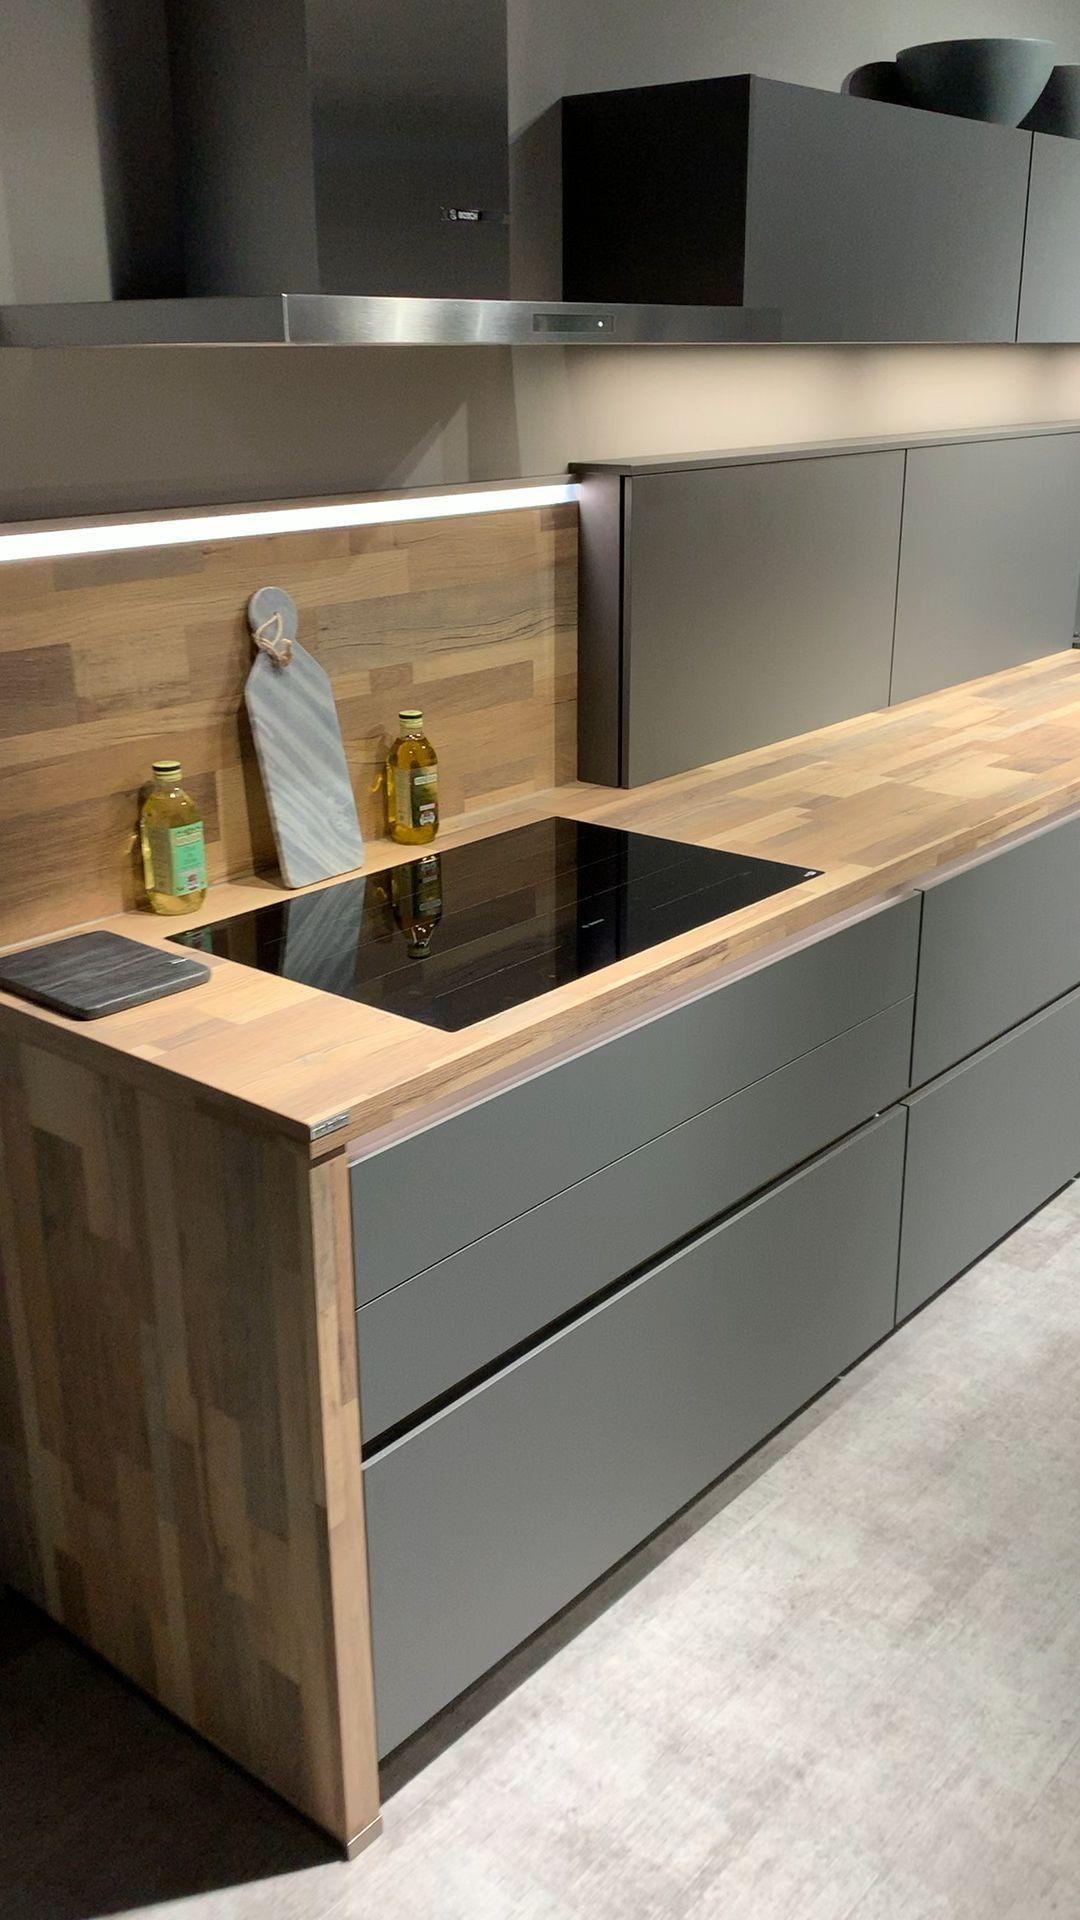 Bathroom Decor Videos Schiefergrau Und Elegant Gra En 2020 Cuisine Design Moderne Cuisine Moderne Design Cuisine Moderne